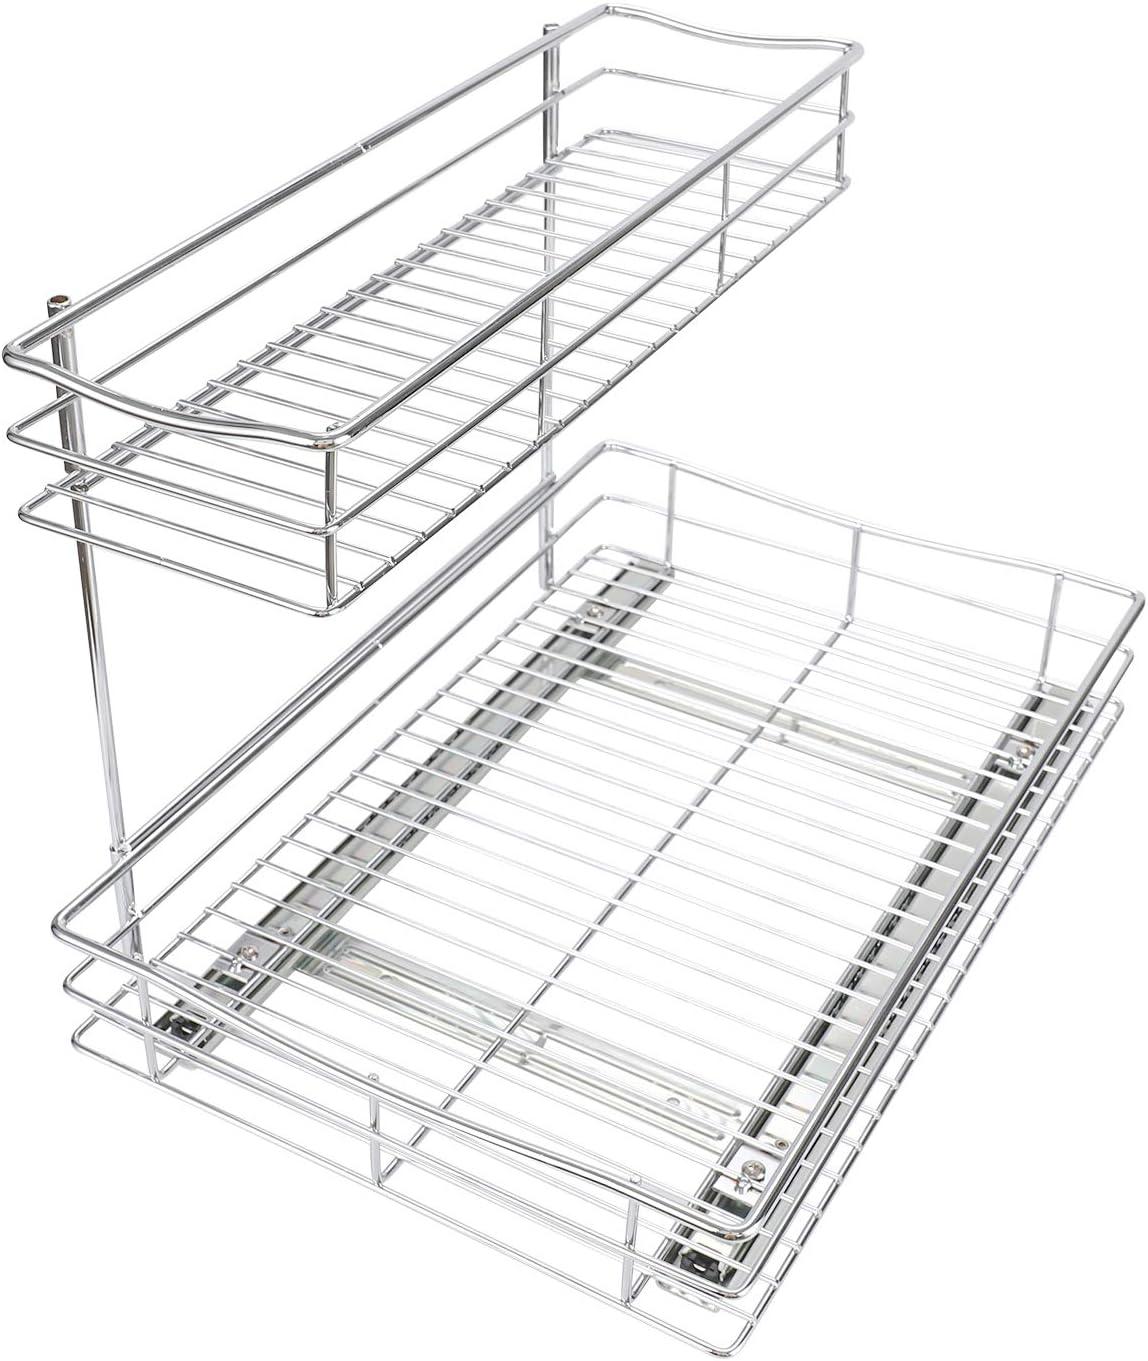 Esylife Pull Out Kitchen Storage Basket 2 Tier Sliding Out Under Sink Cabinet Organiser Shelf Fit For 400mm Wide Cabinet Under Shelf Storage Home Kitchen Chefhouseresort Com Np